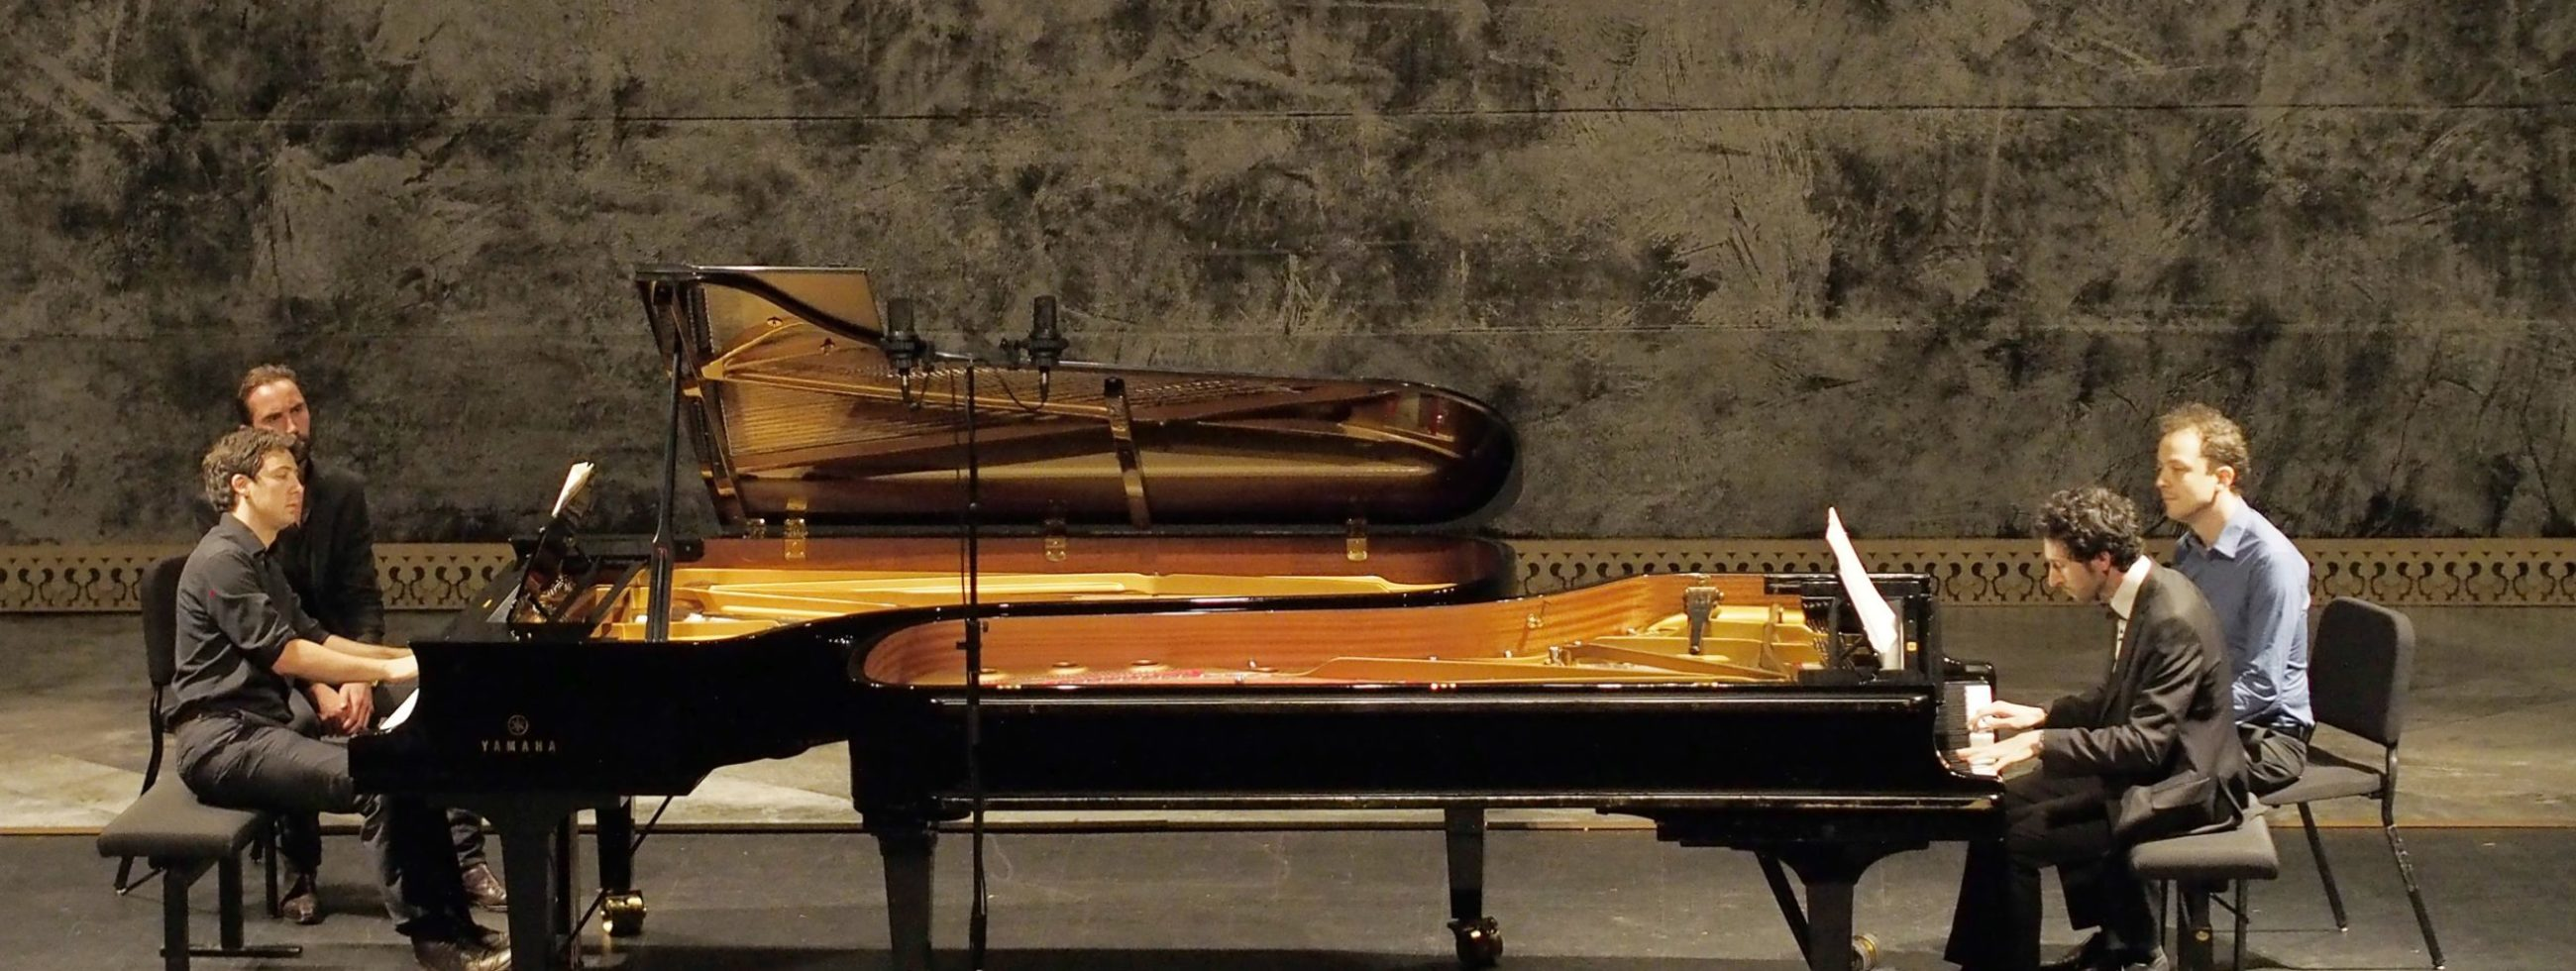 piano duo amateur